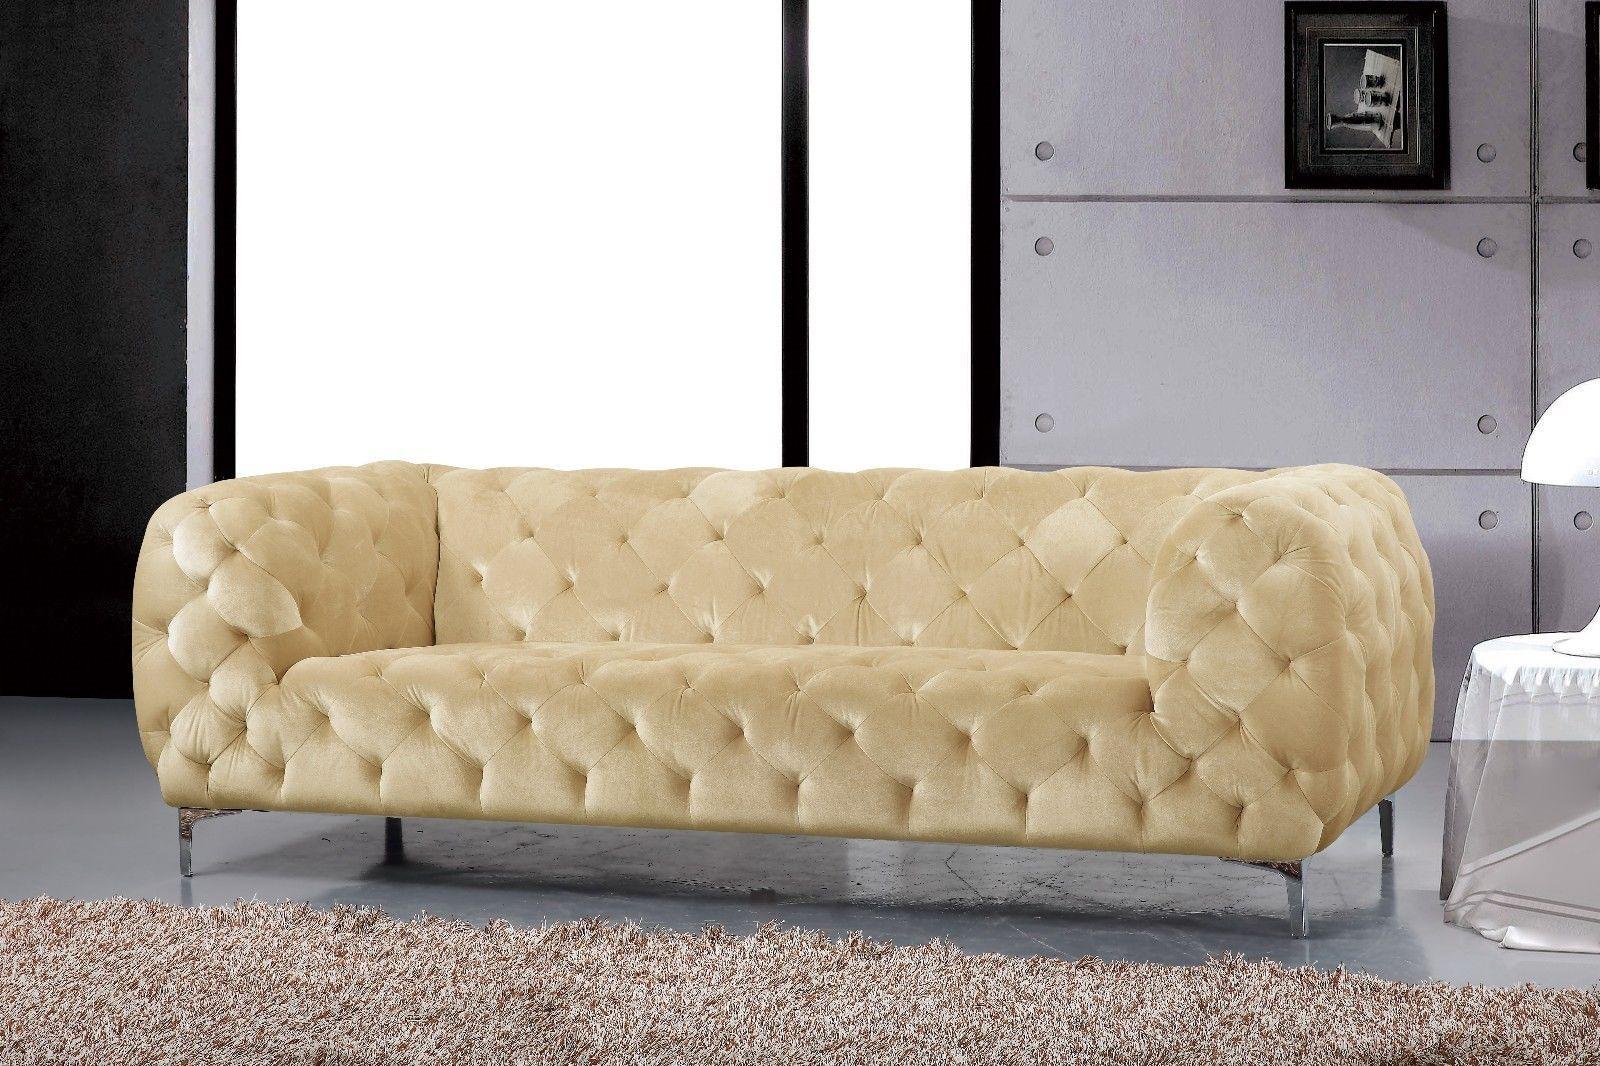 Meridian 646 Mercer Living Room Sofa in Beige Chrome Legs Contemporary Style